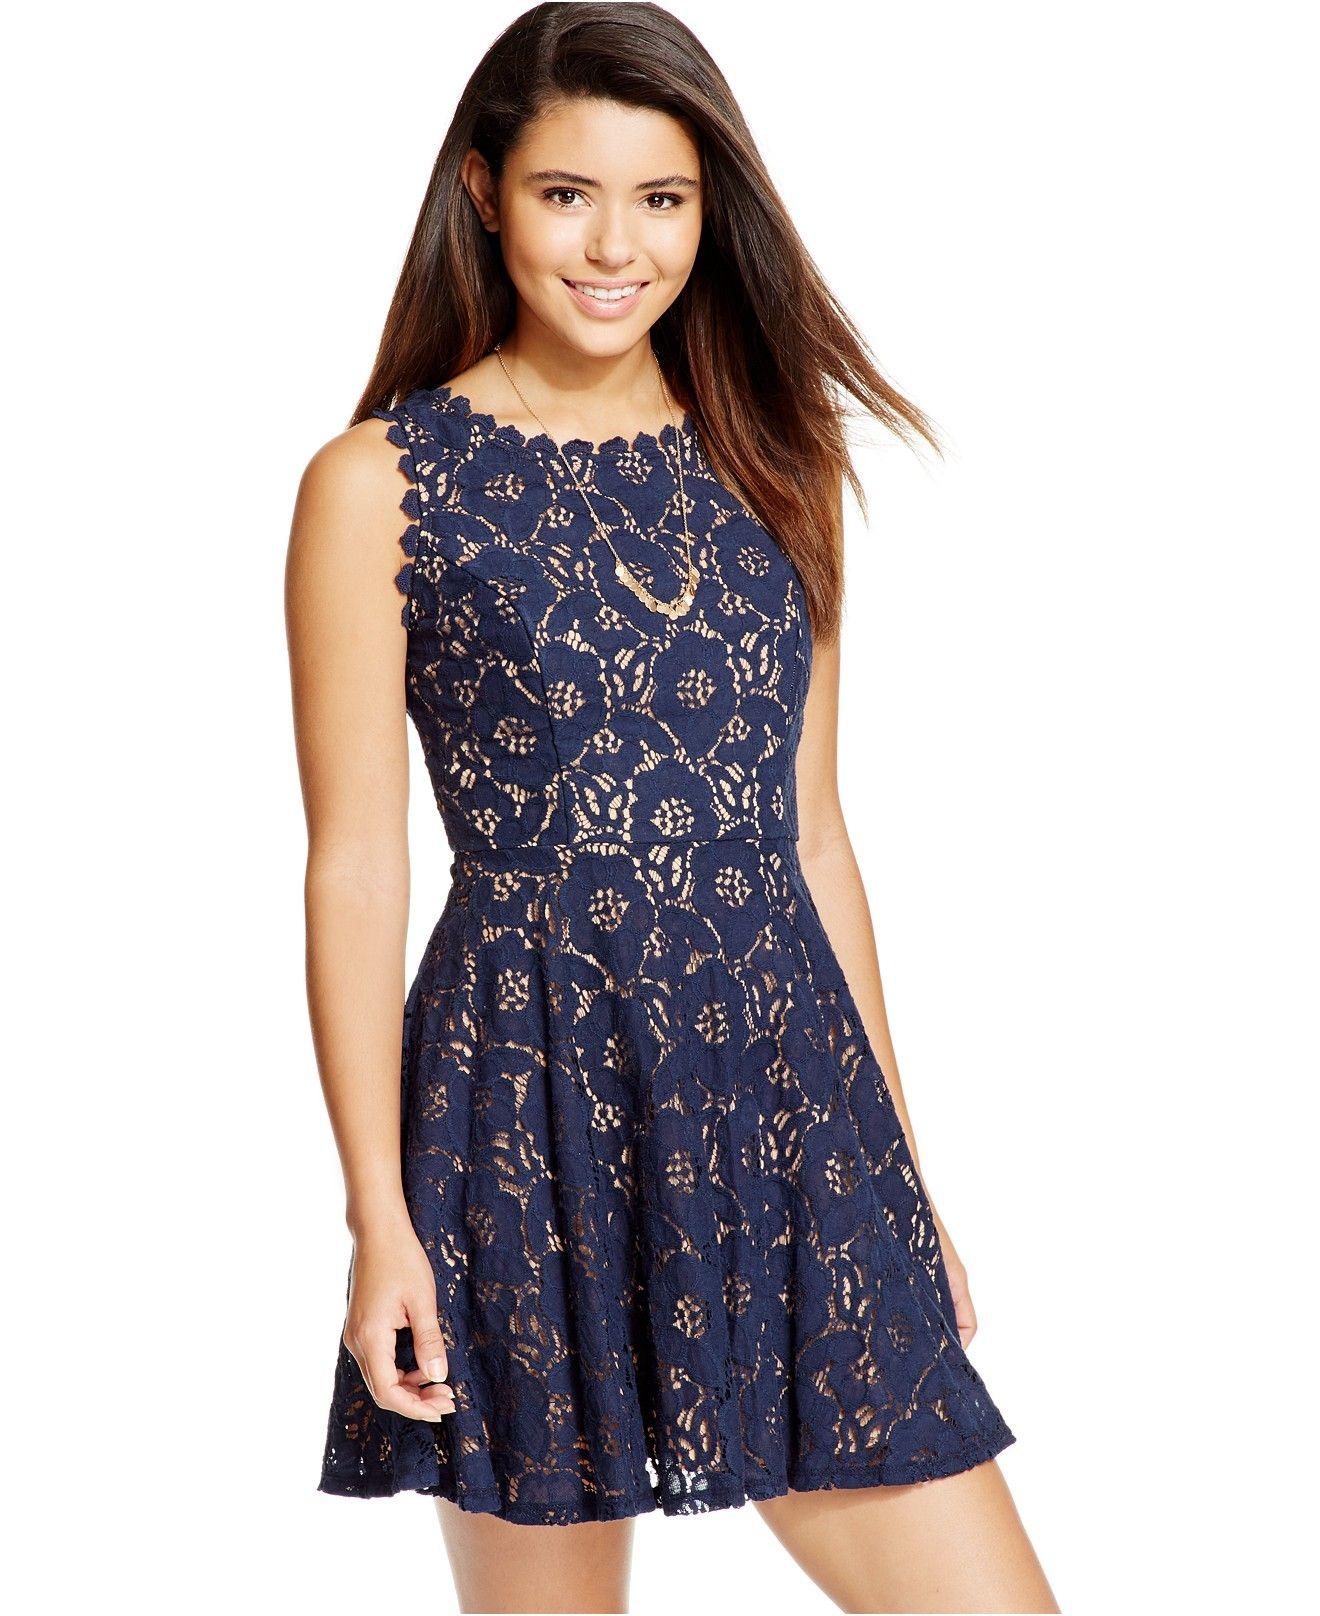 Juniors Lace Fit Amp Flare Dress Dresses Junior Dresses